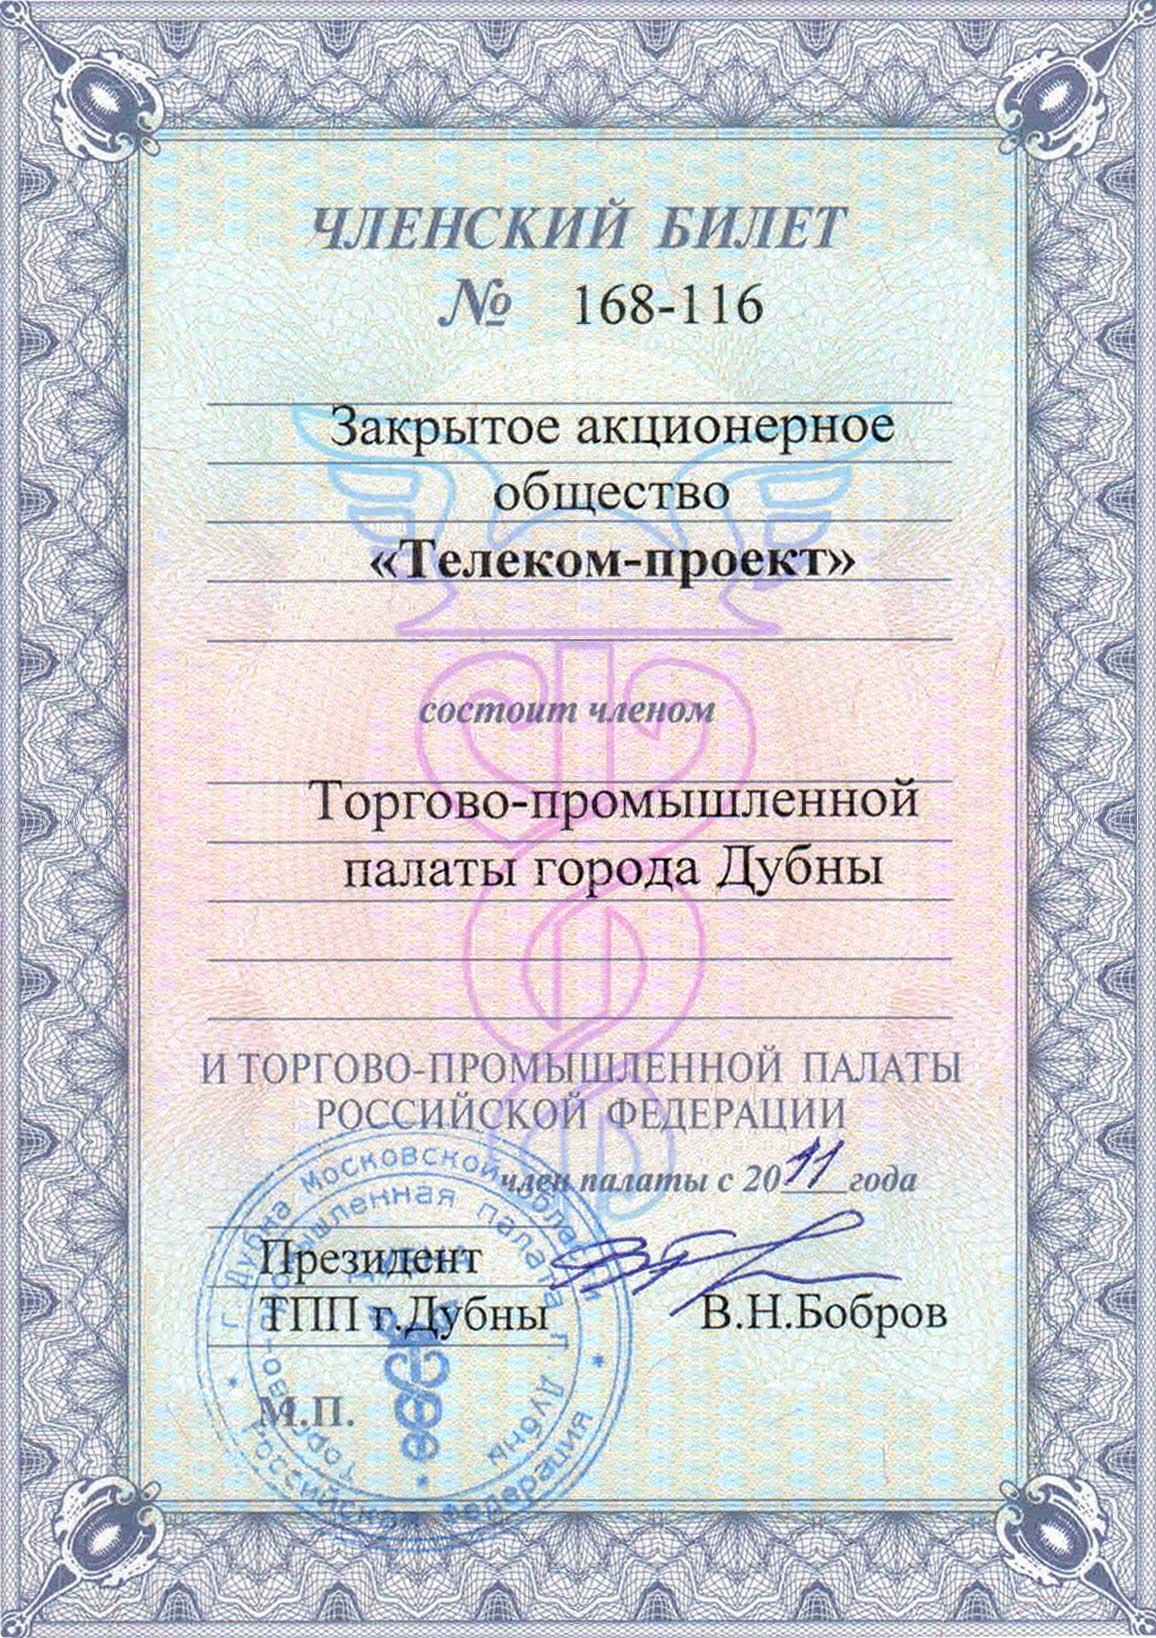 Членский билет ТПП Дубны